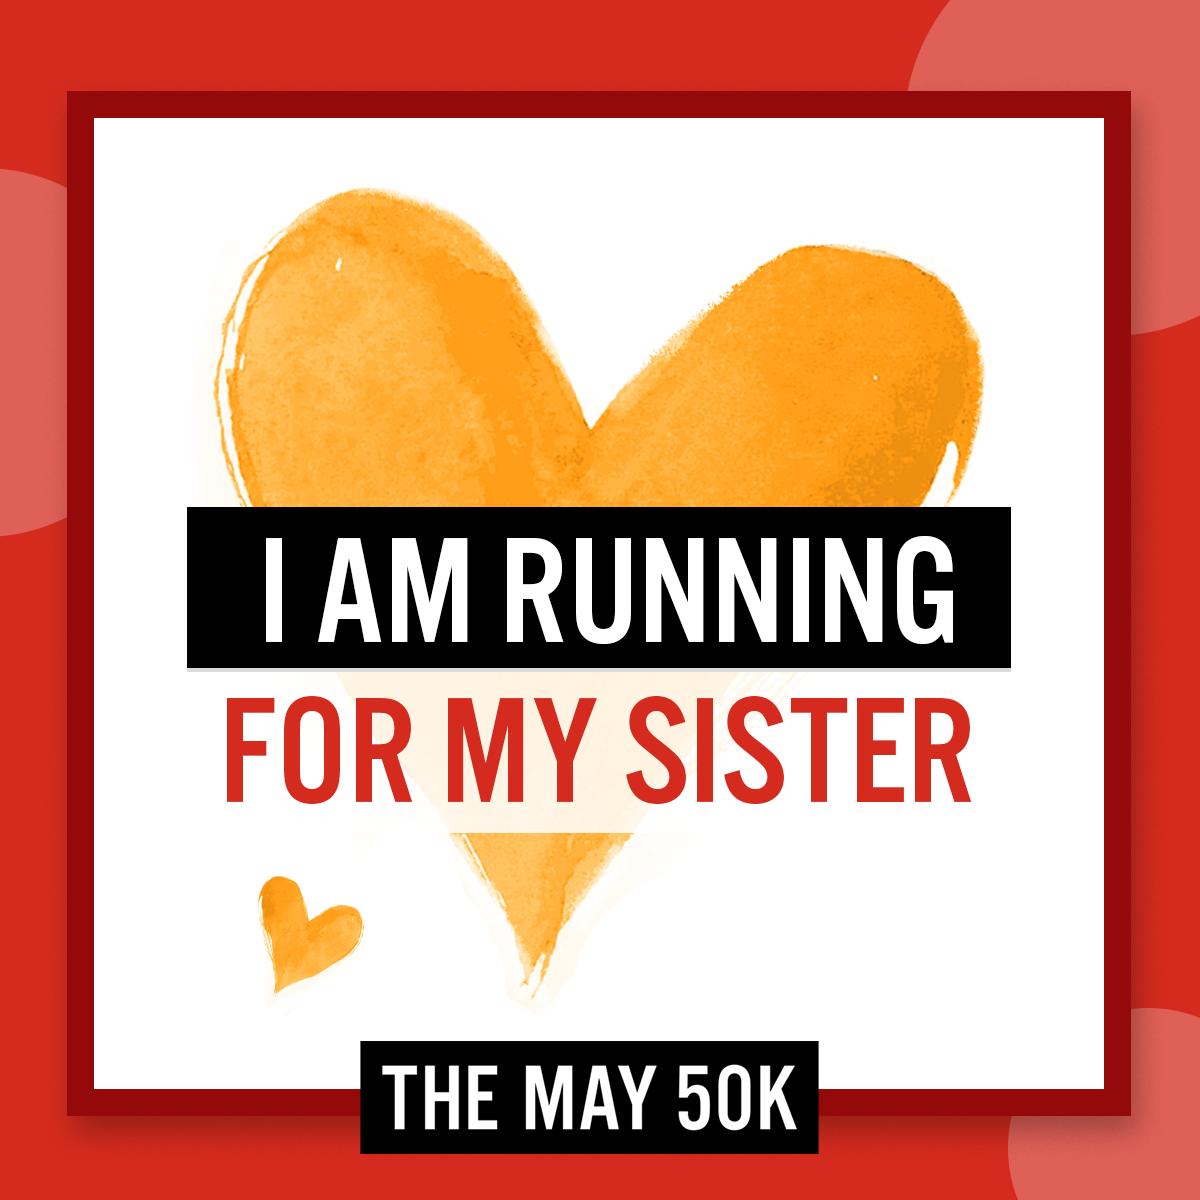 Run for Sister